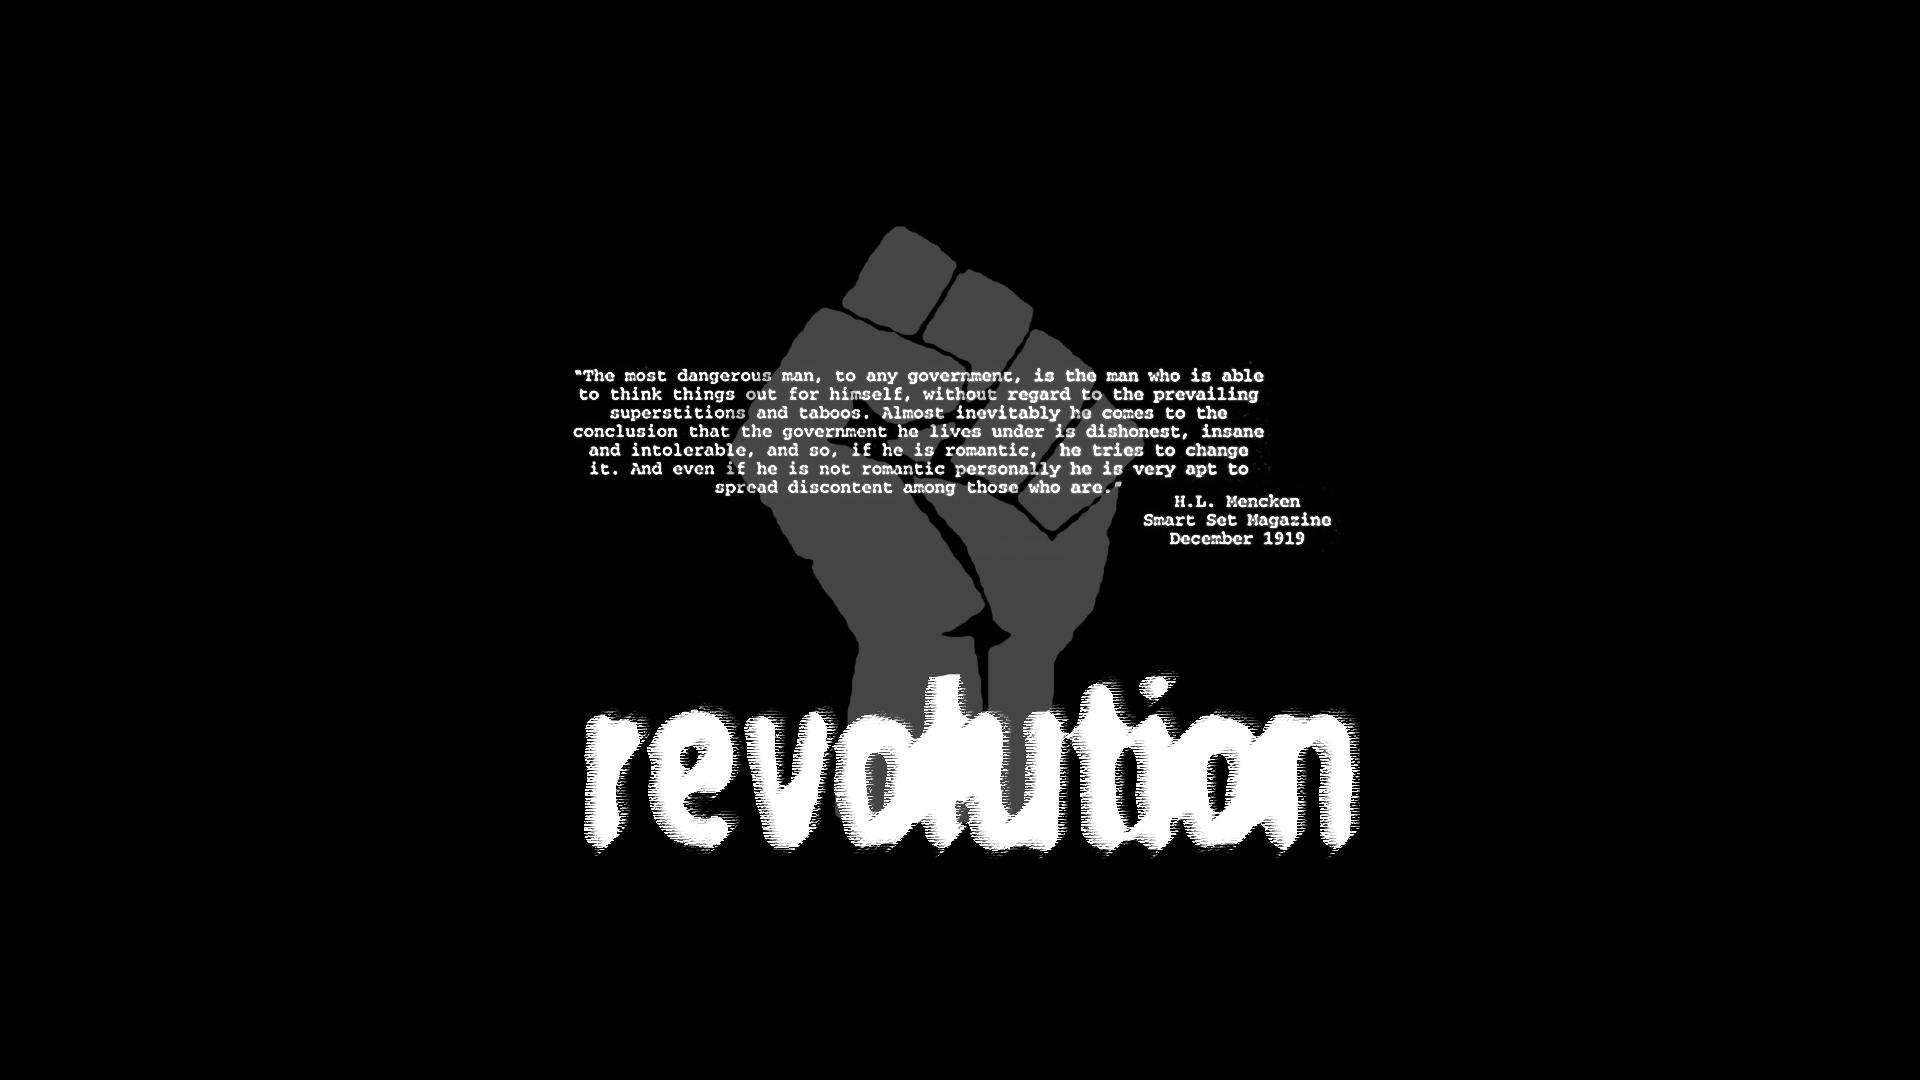 Revolution quote #5